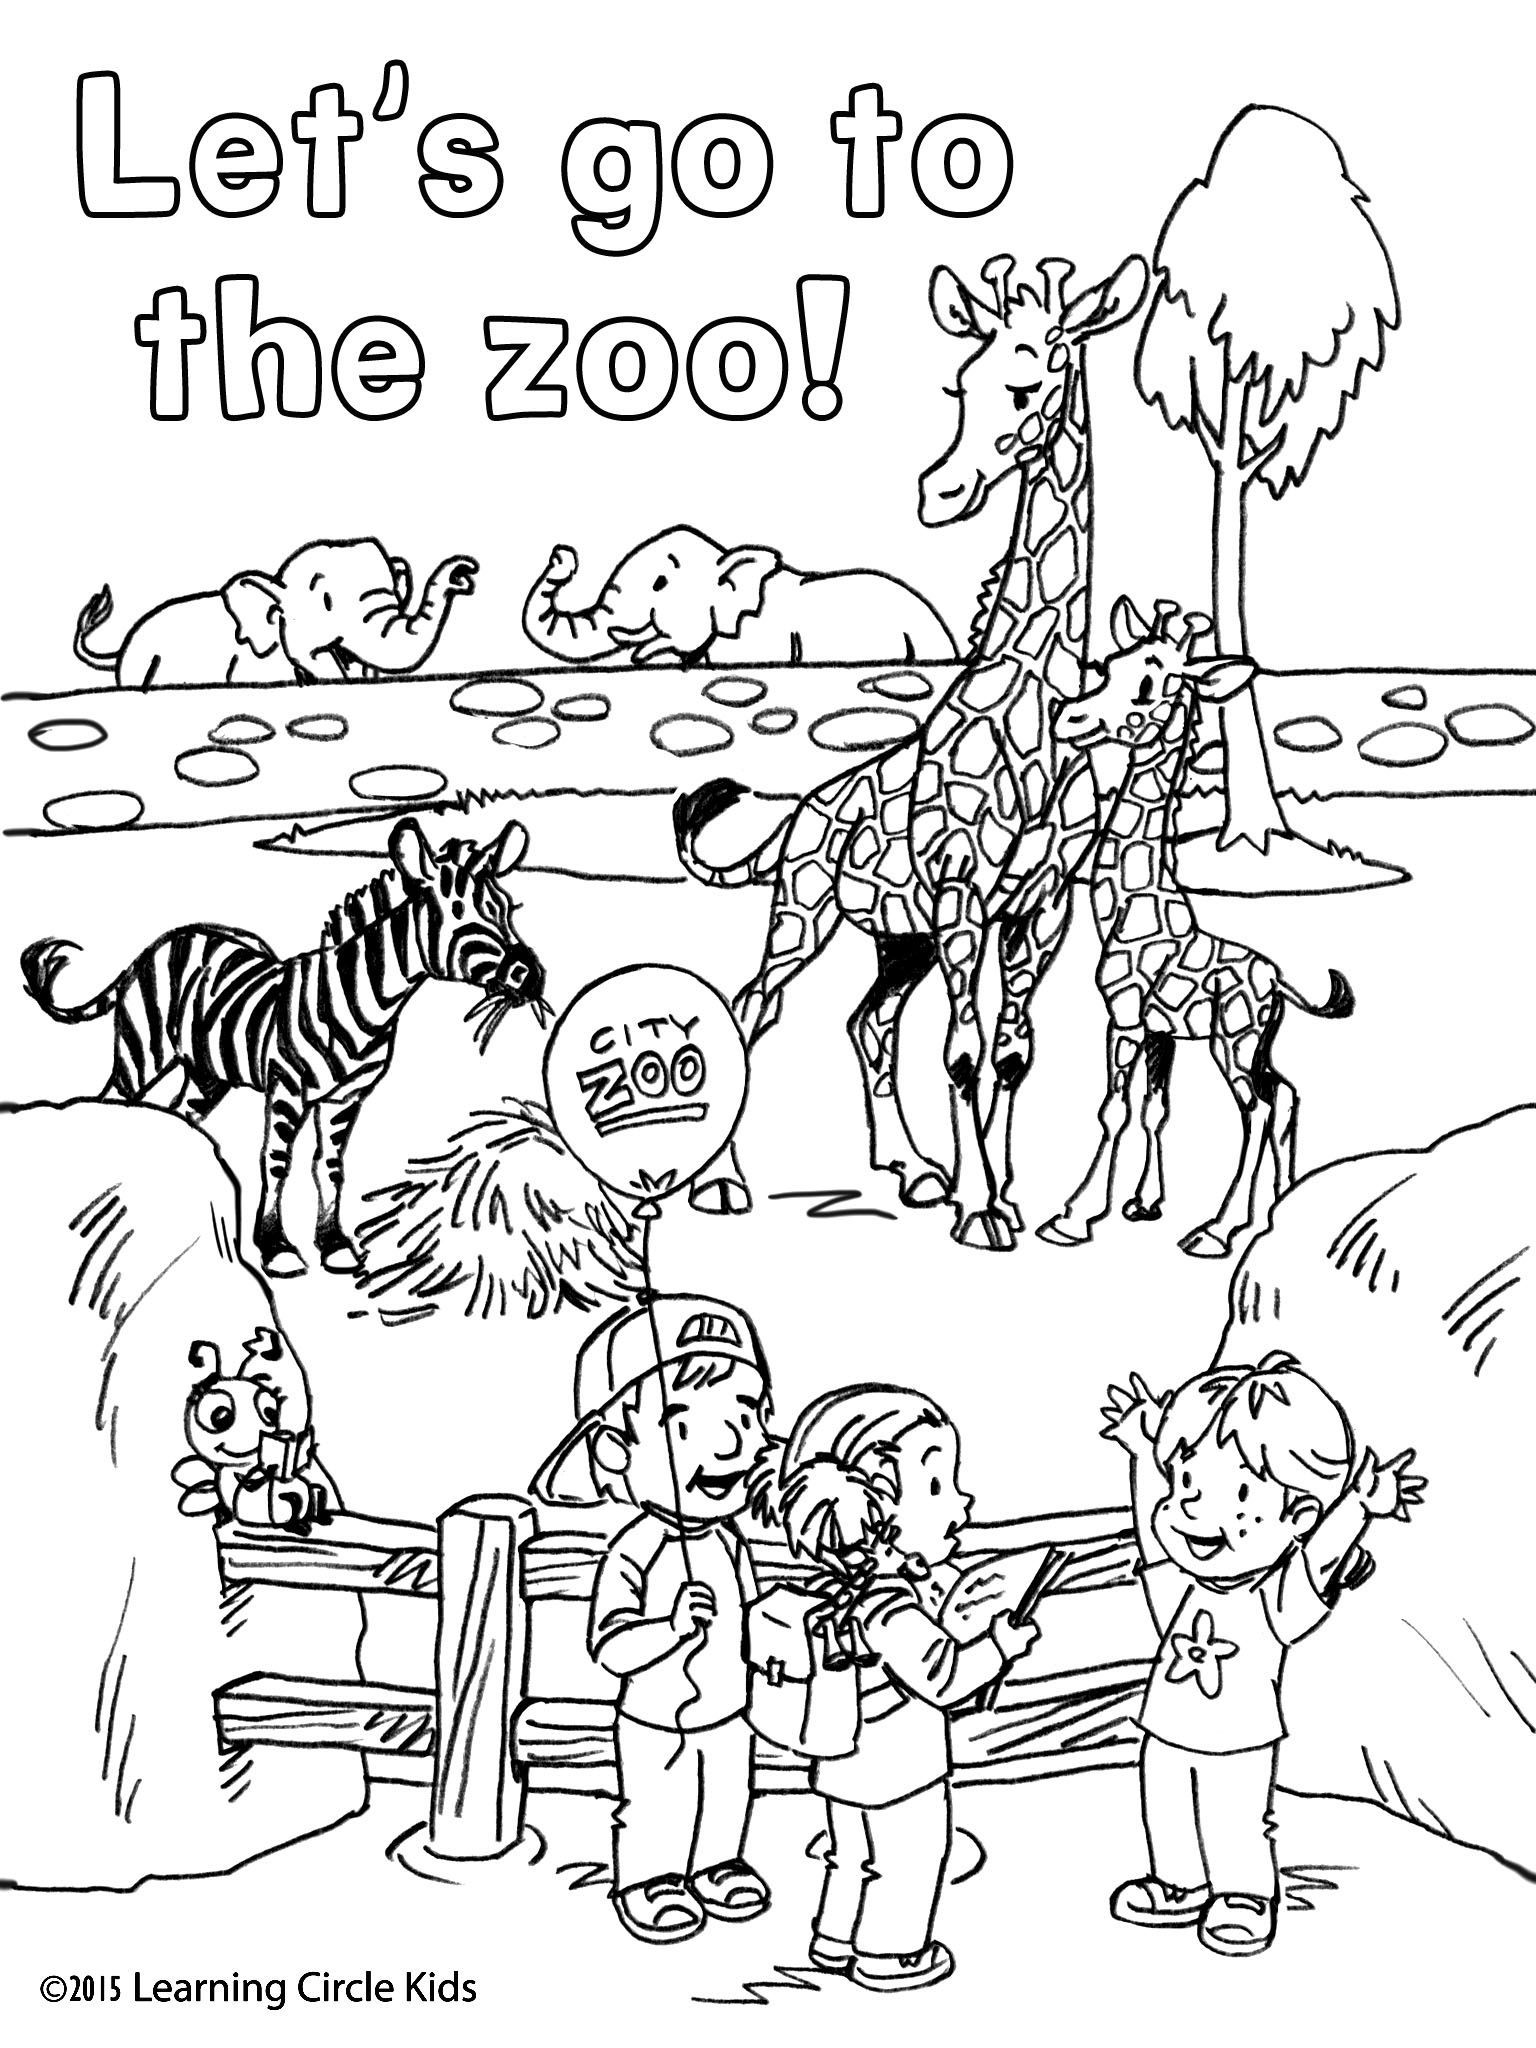 Reader Bee Characters Carlos Angela And Joy Enjoy Their Trip To The Zoo Children Kids Zoo Boyama Sayfalari Ingilizce Ailem